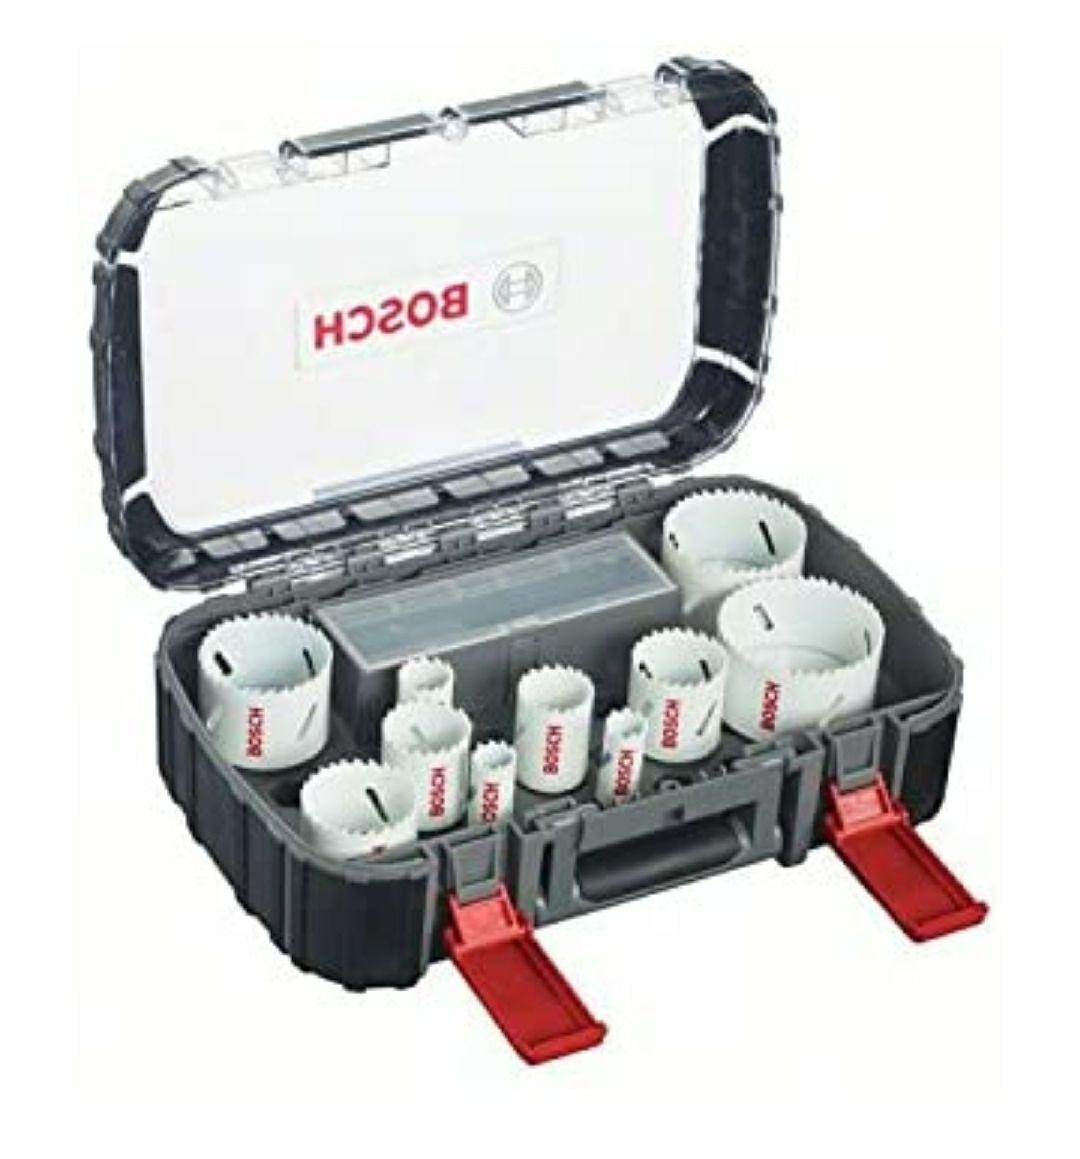 Bosch Professional 2608580878 Sierras de Corona, 850 V, Set de 14 Piezas